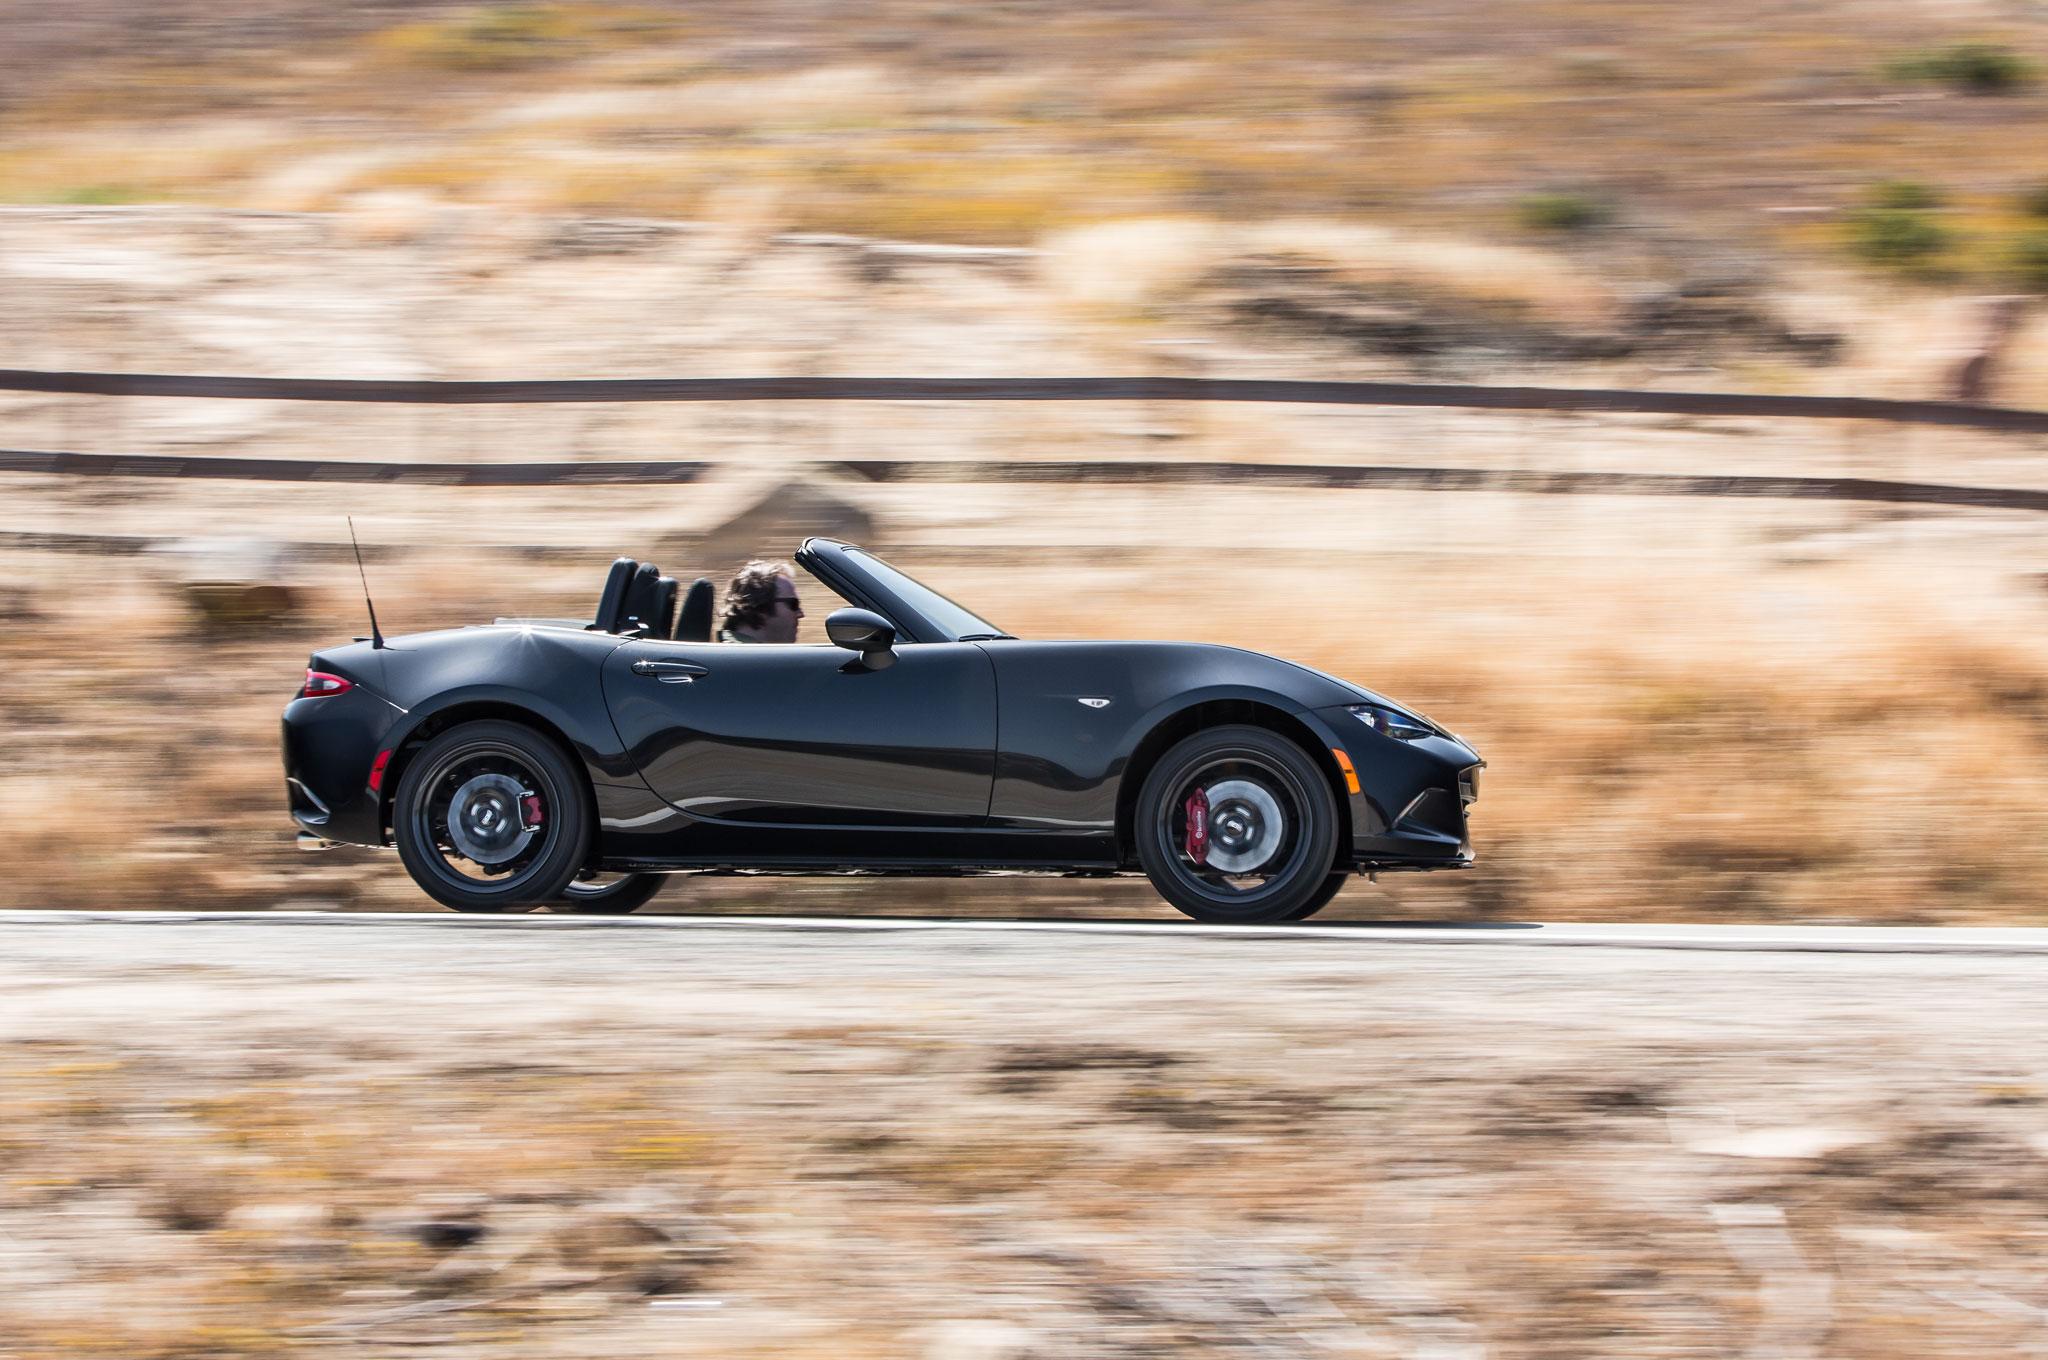 2016 Mazda MX-5 Miata Club Review